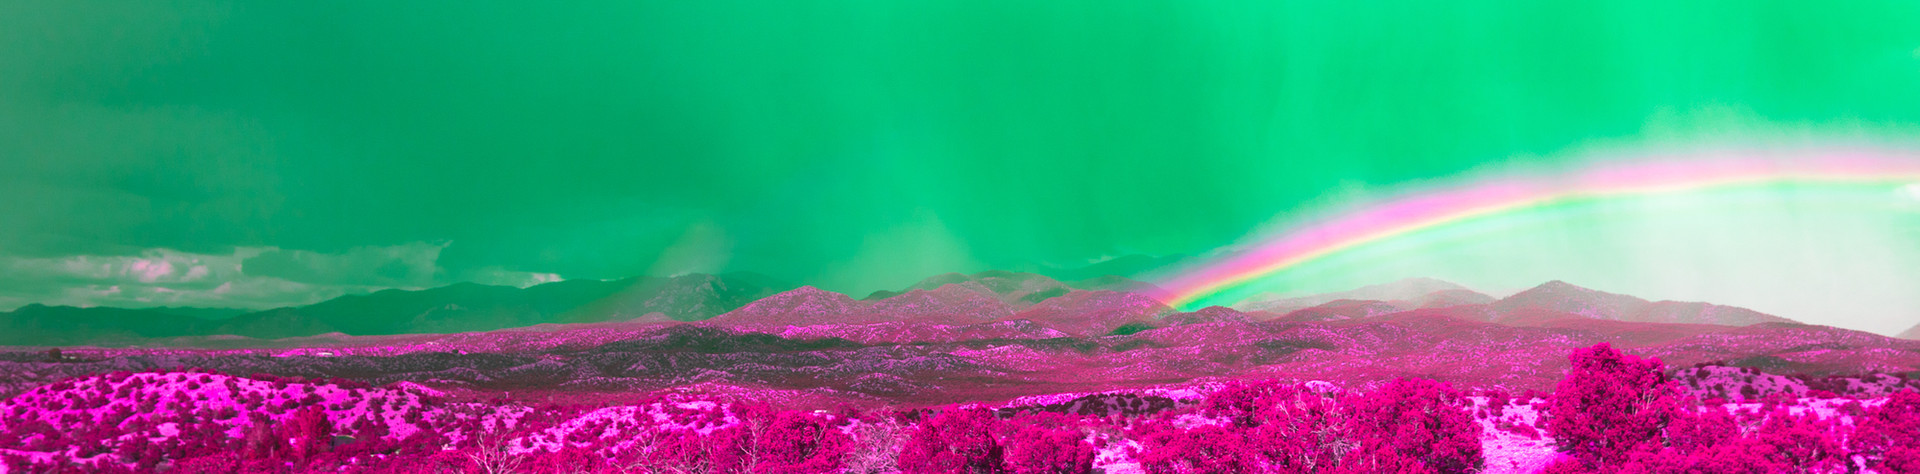 Rainbows Art-24.jpg